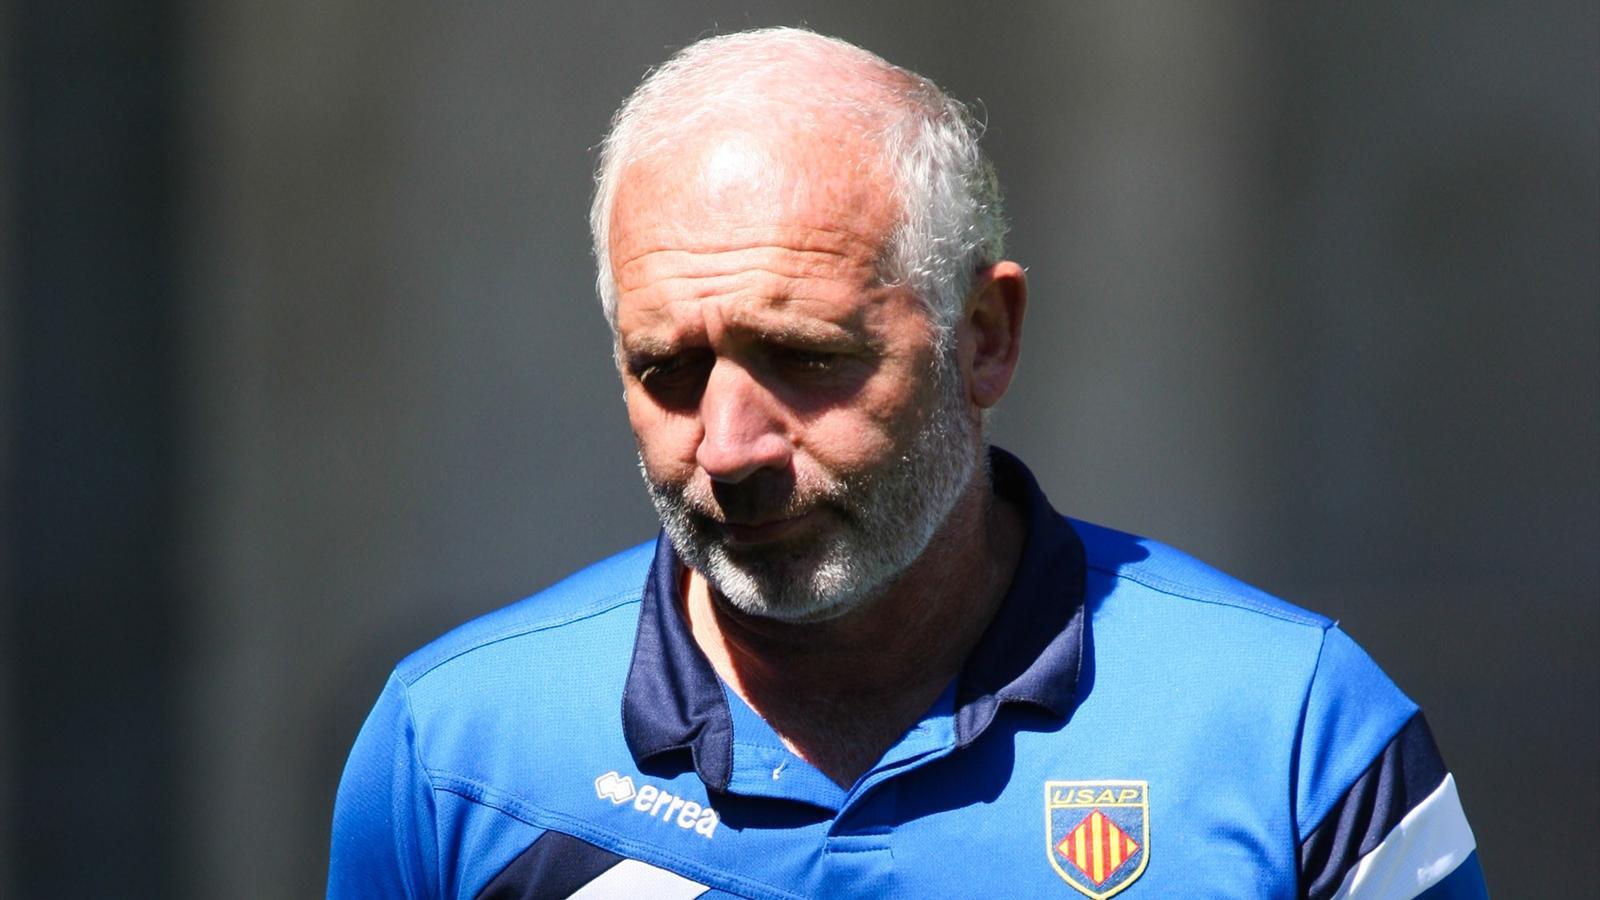 Alain Hyardet ne sera plus directeur du rugby de Perpignan l'an prochain